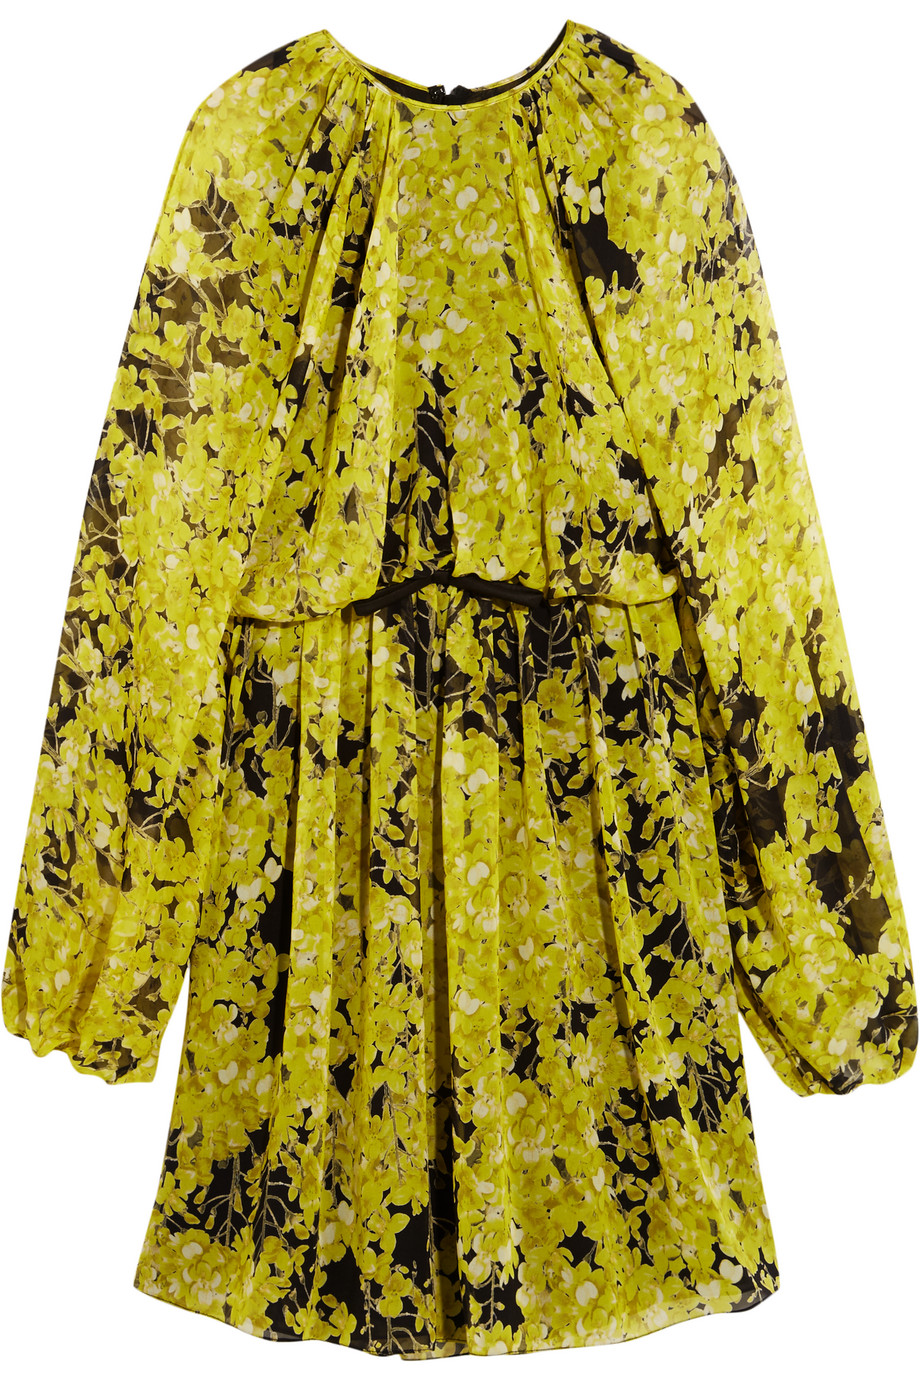 Floral-Print Silk-Chiffon Mini Dress, Giambattista Valli, Yellow, Women's - floral print, Size: 44